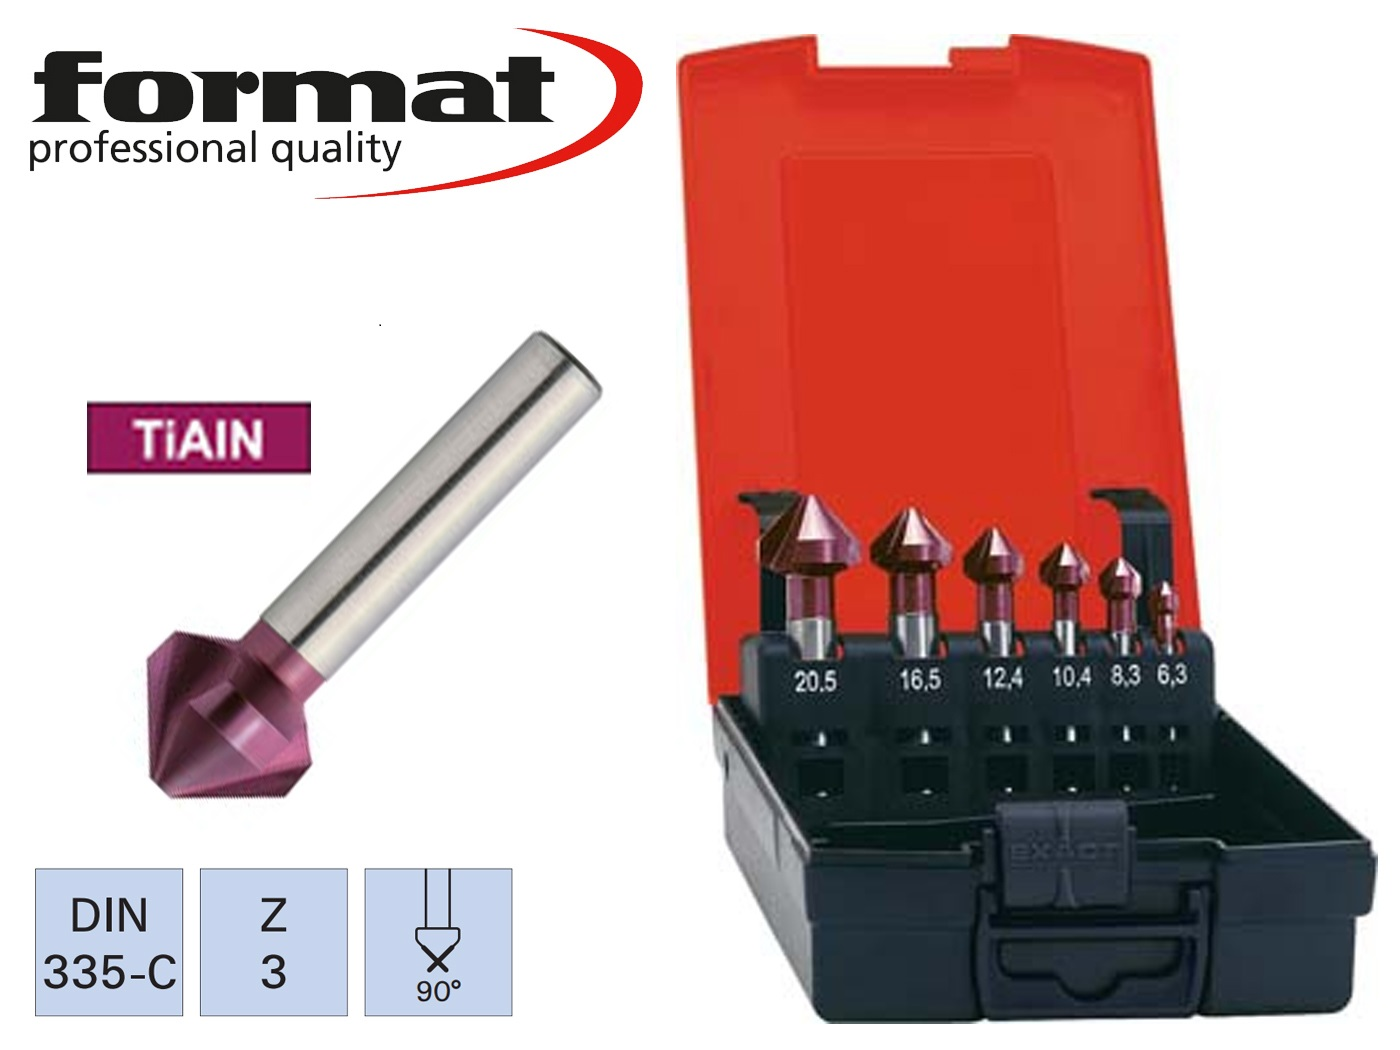 verzinkborenset DIN 335 C HSS TiAIN 90 G FORMAT   DKMTools - DKM Tools